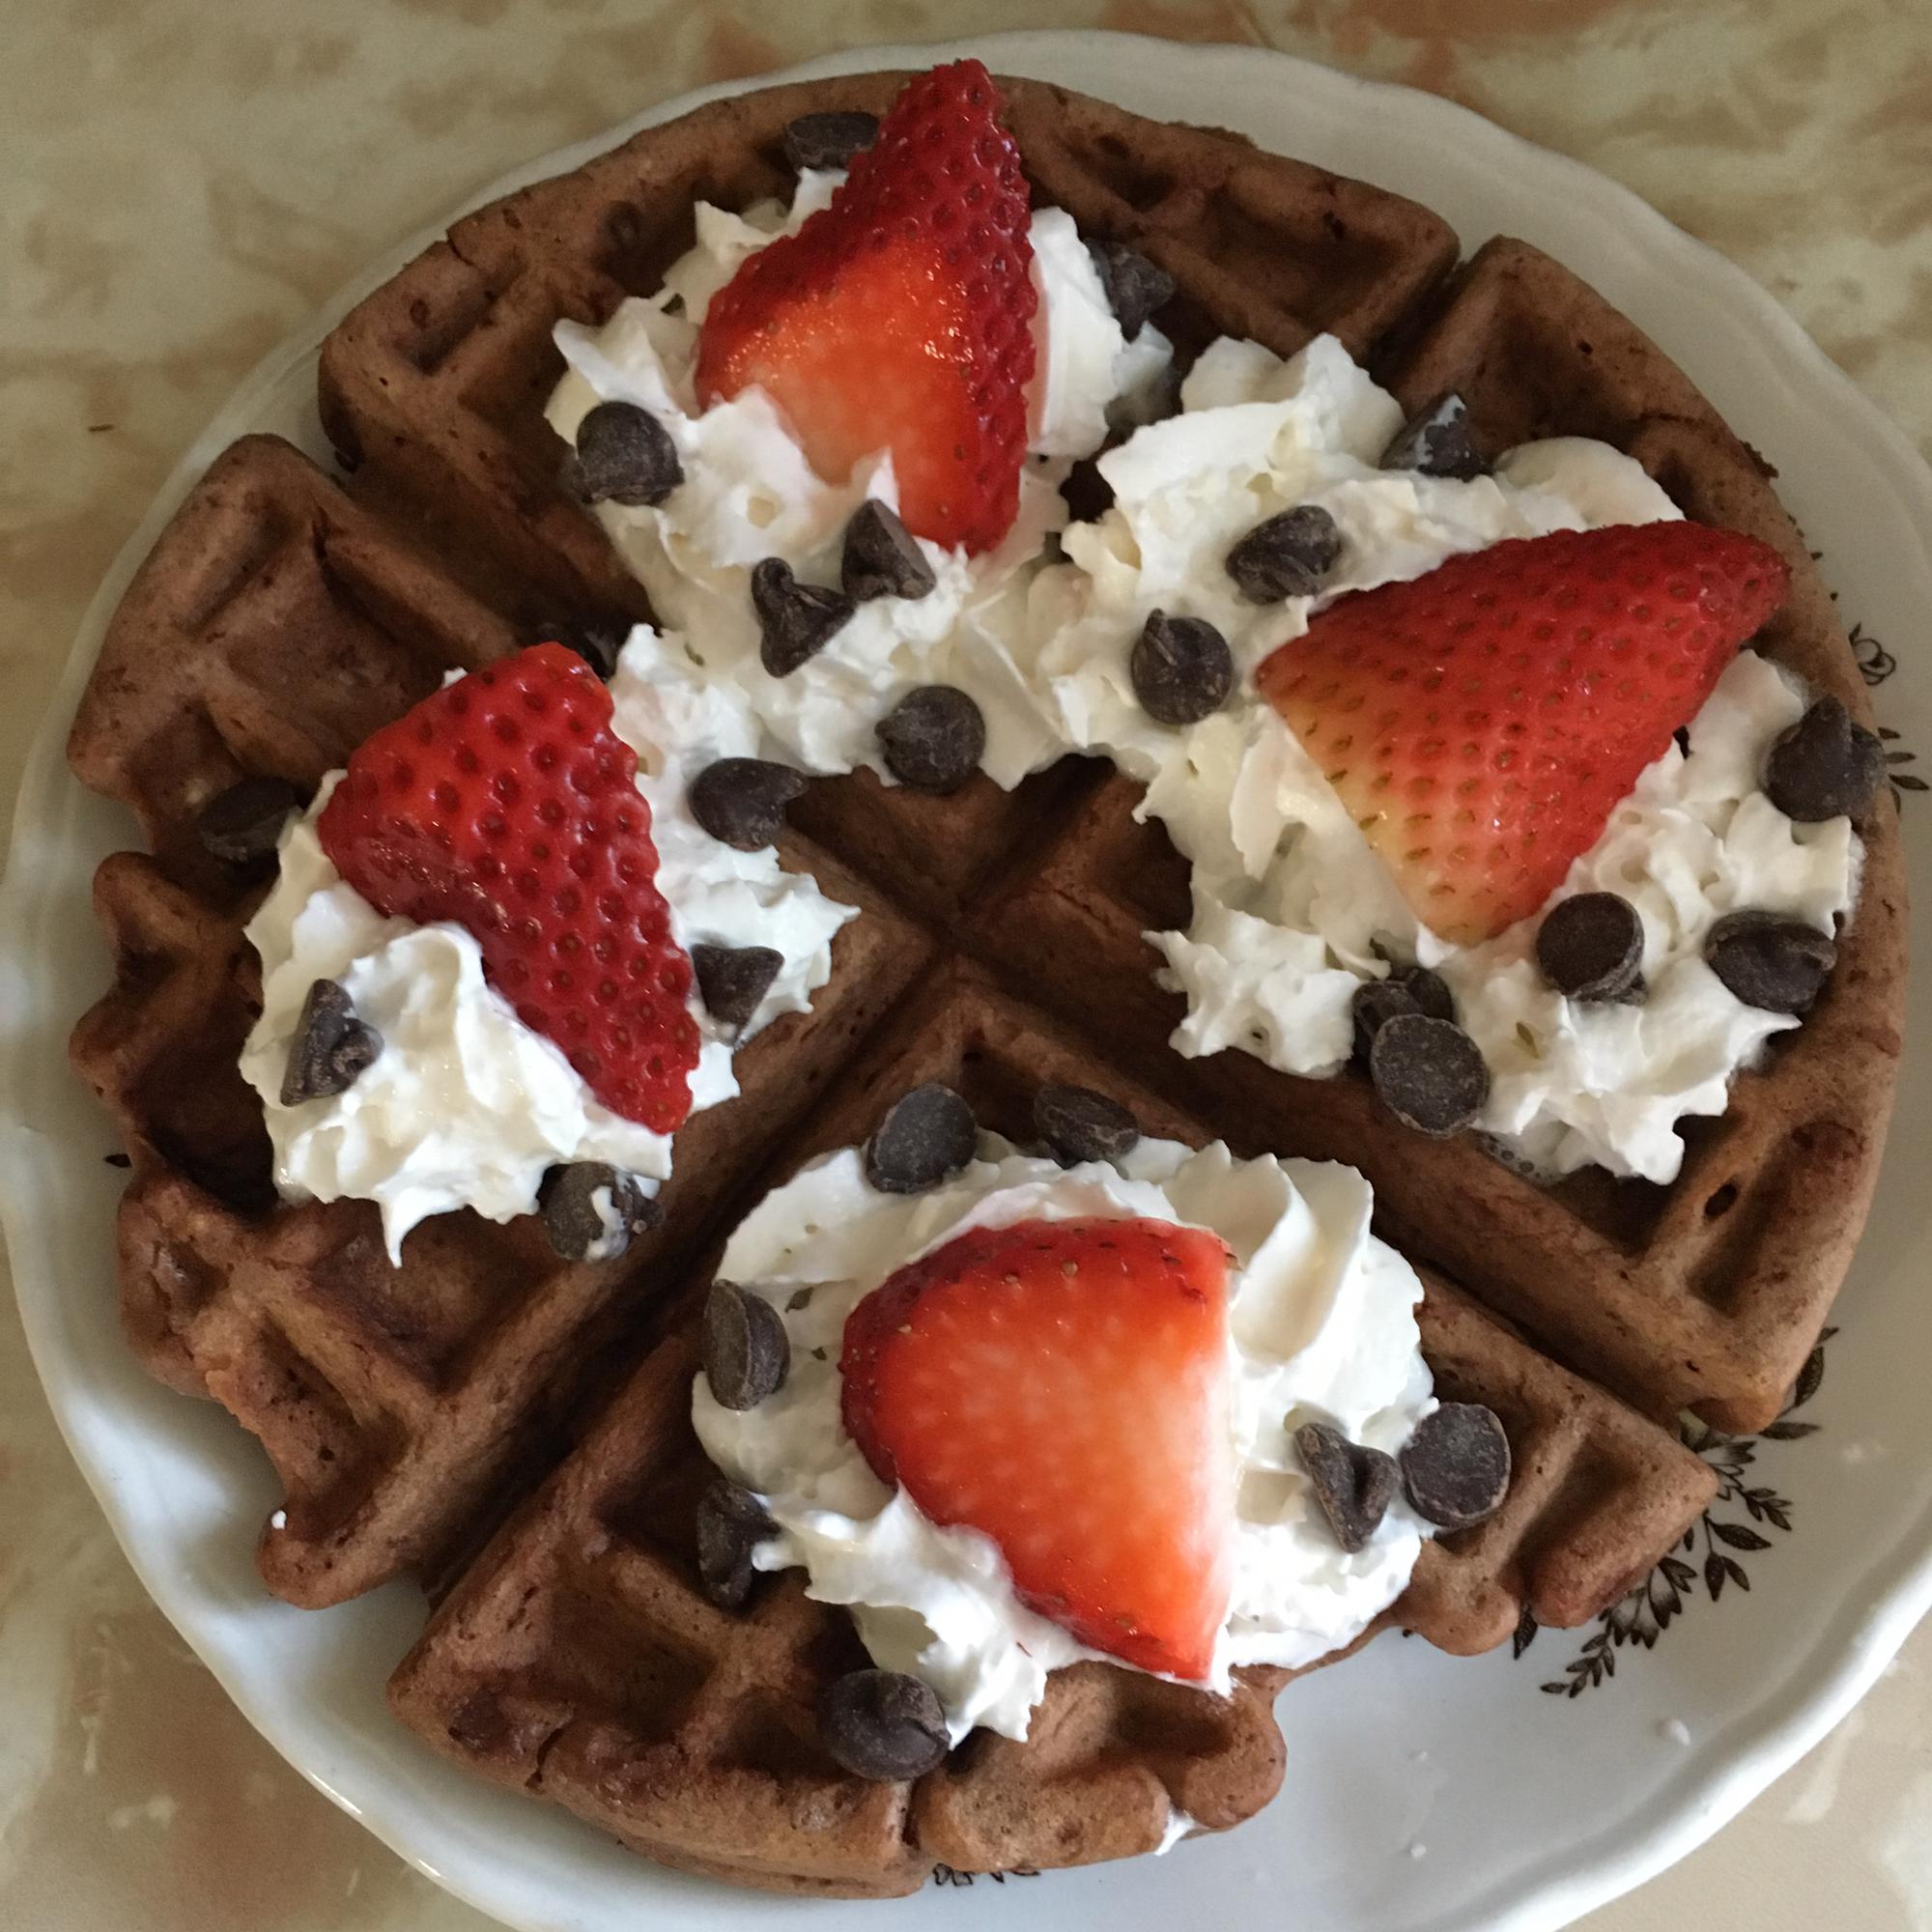 Chocolate Waffles